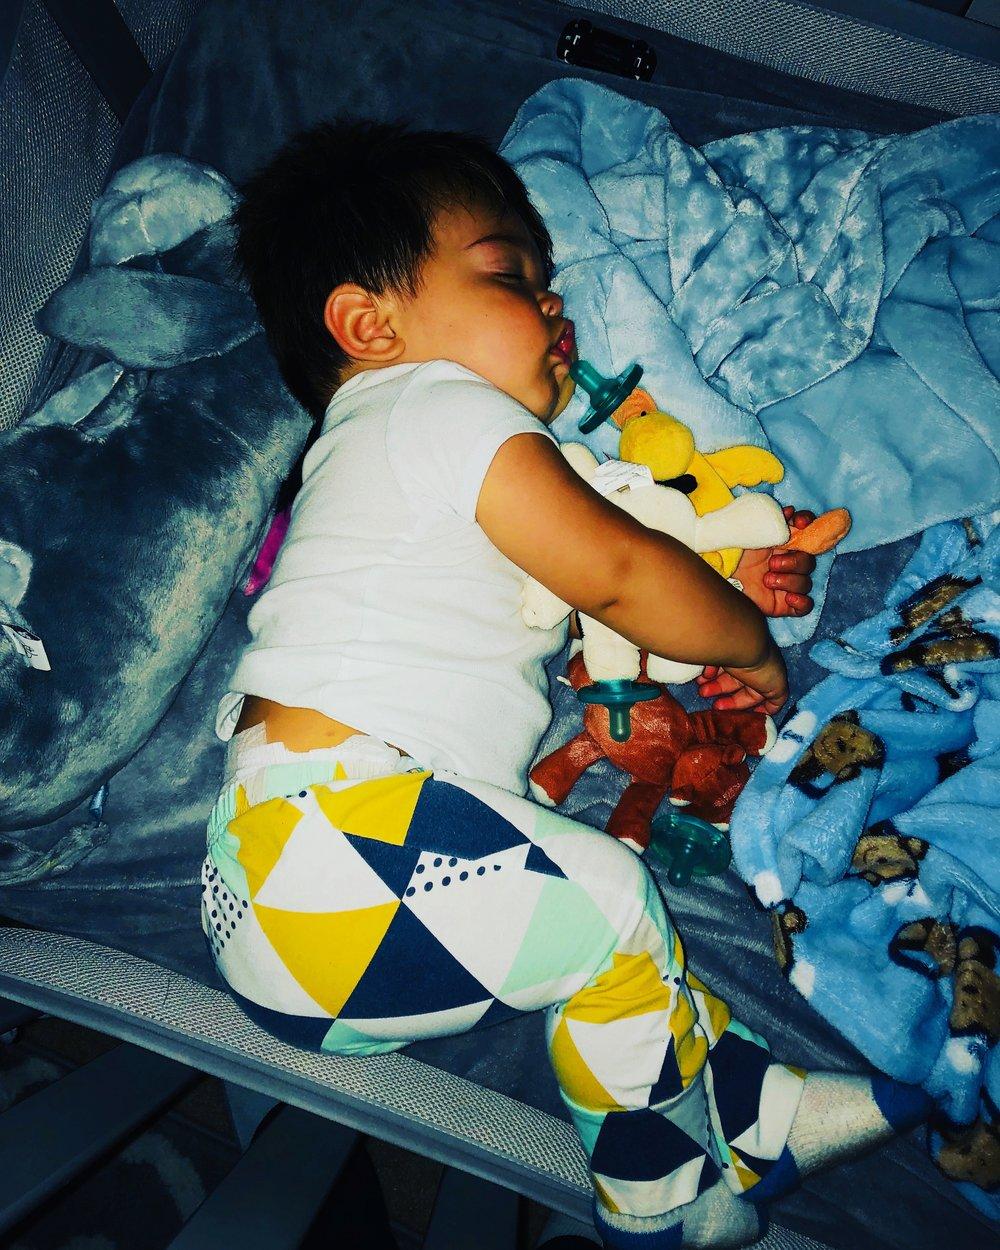 Wubbanub pacifiers are great for helping babies sleep